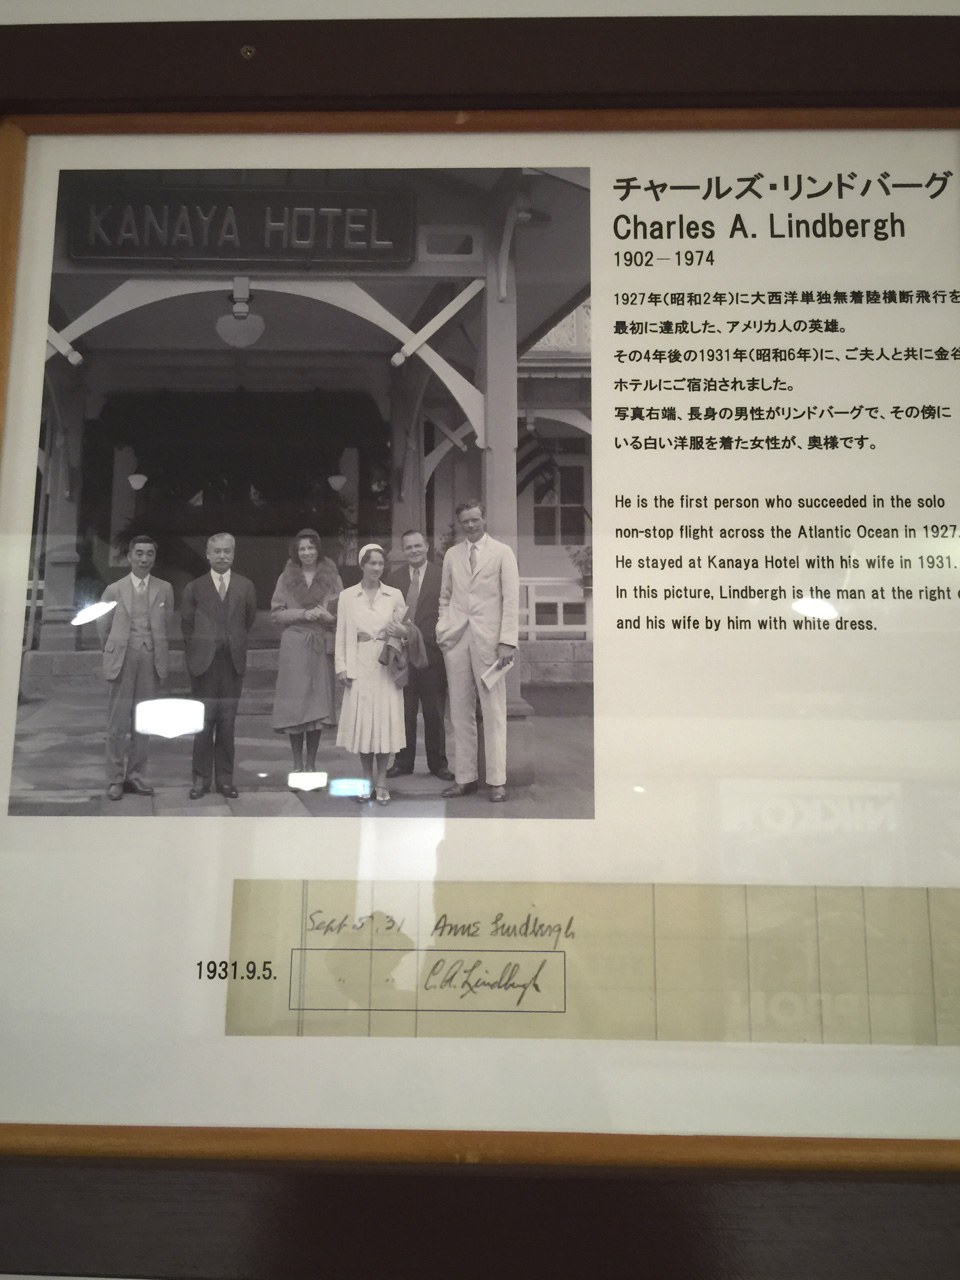 Nikko Kanaya Hotel Charles Lindburgh